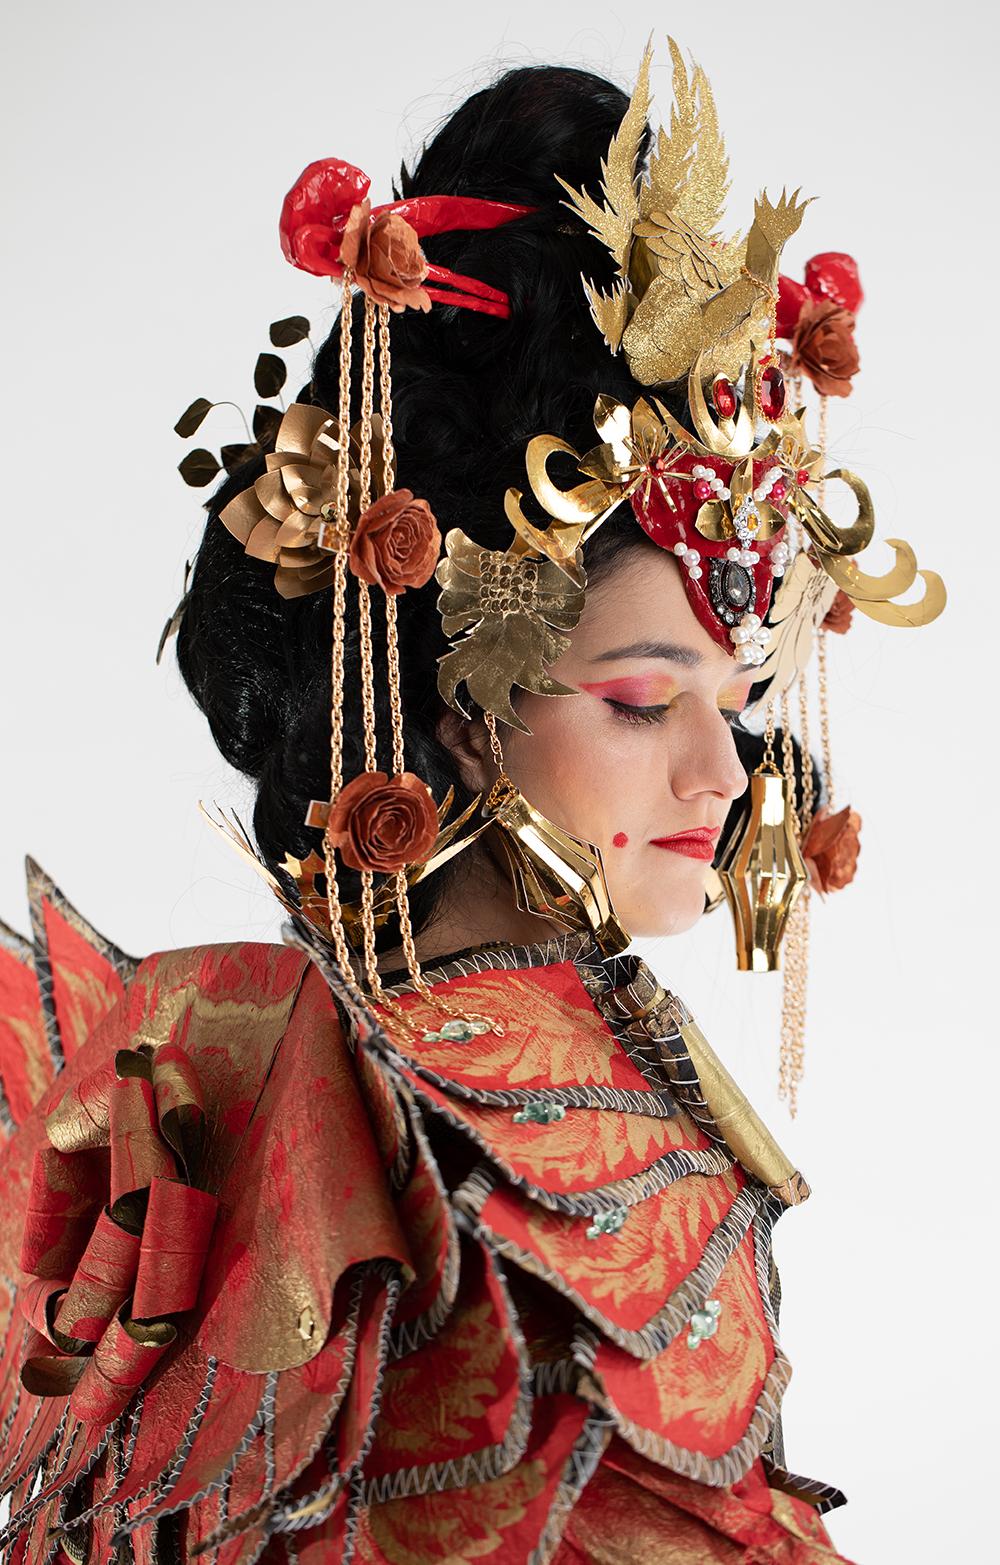 Empress at Forbidden City  Tissue paper, mulberry paper, Japanese mulberry paper, paper yarn, cardboard, papier-mache, dye, paint, glue, tape, wire Photo: Grant Wells